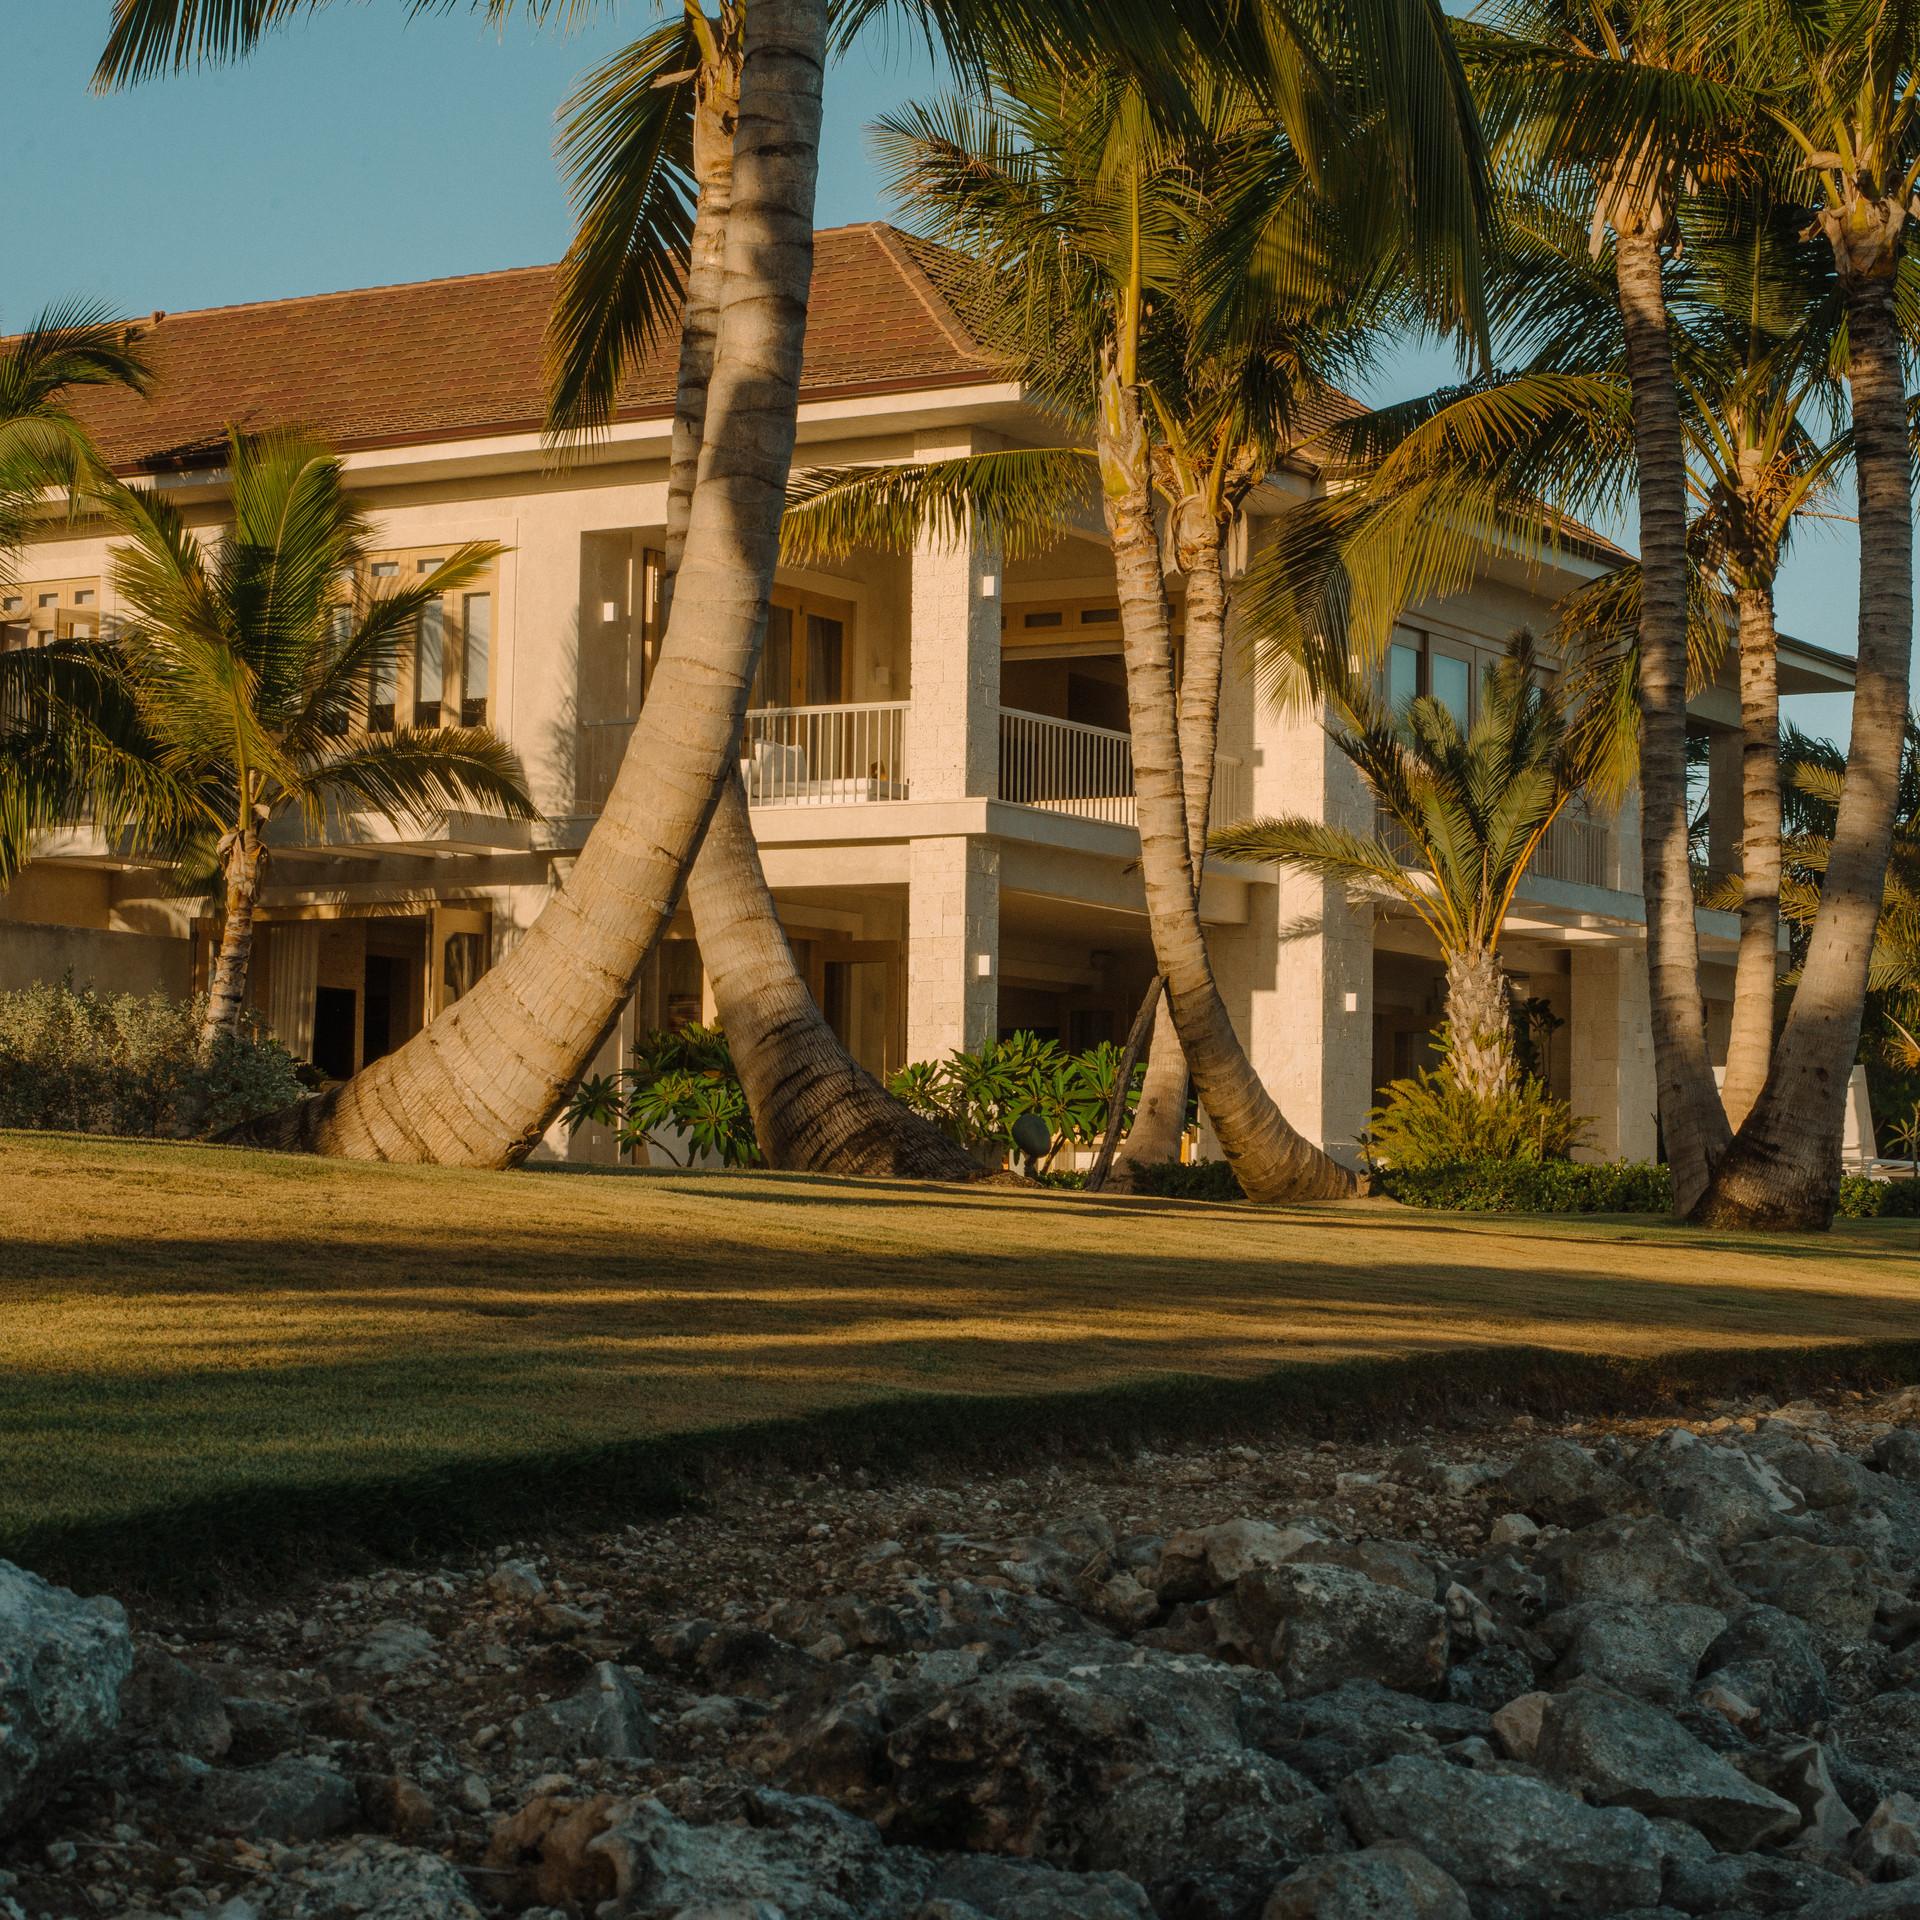 Hacienda A5, puntacana resort, casa del lago, lake house, punta cana